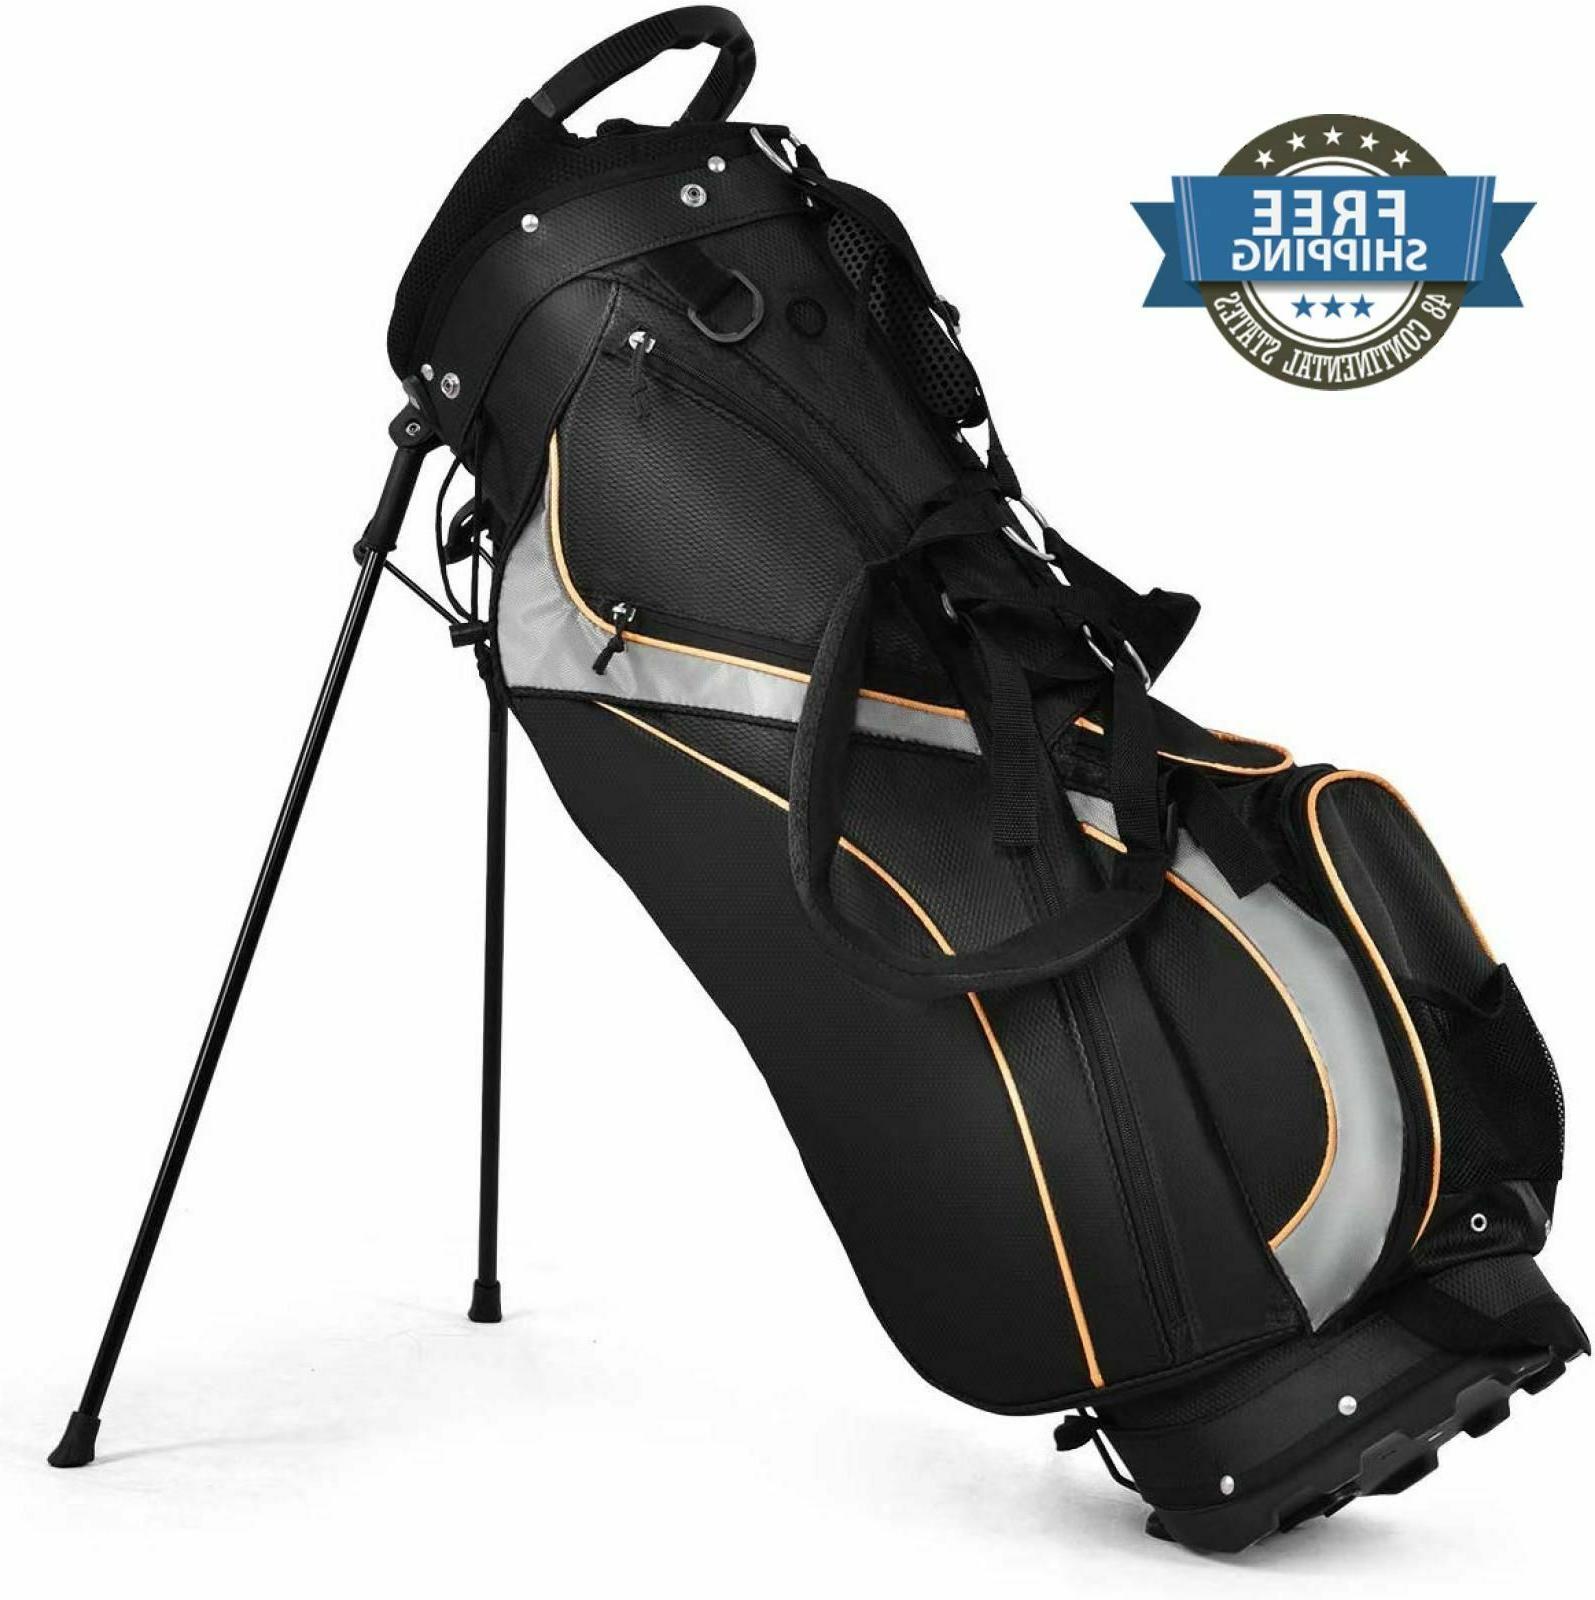 Golf Cart Bag Carry 7 Way Dividers Holder Stand Storage Rack